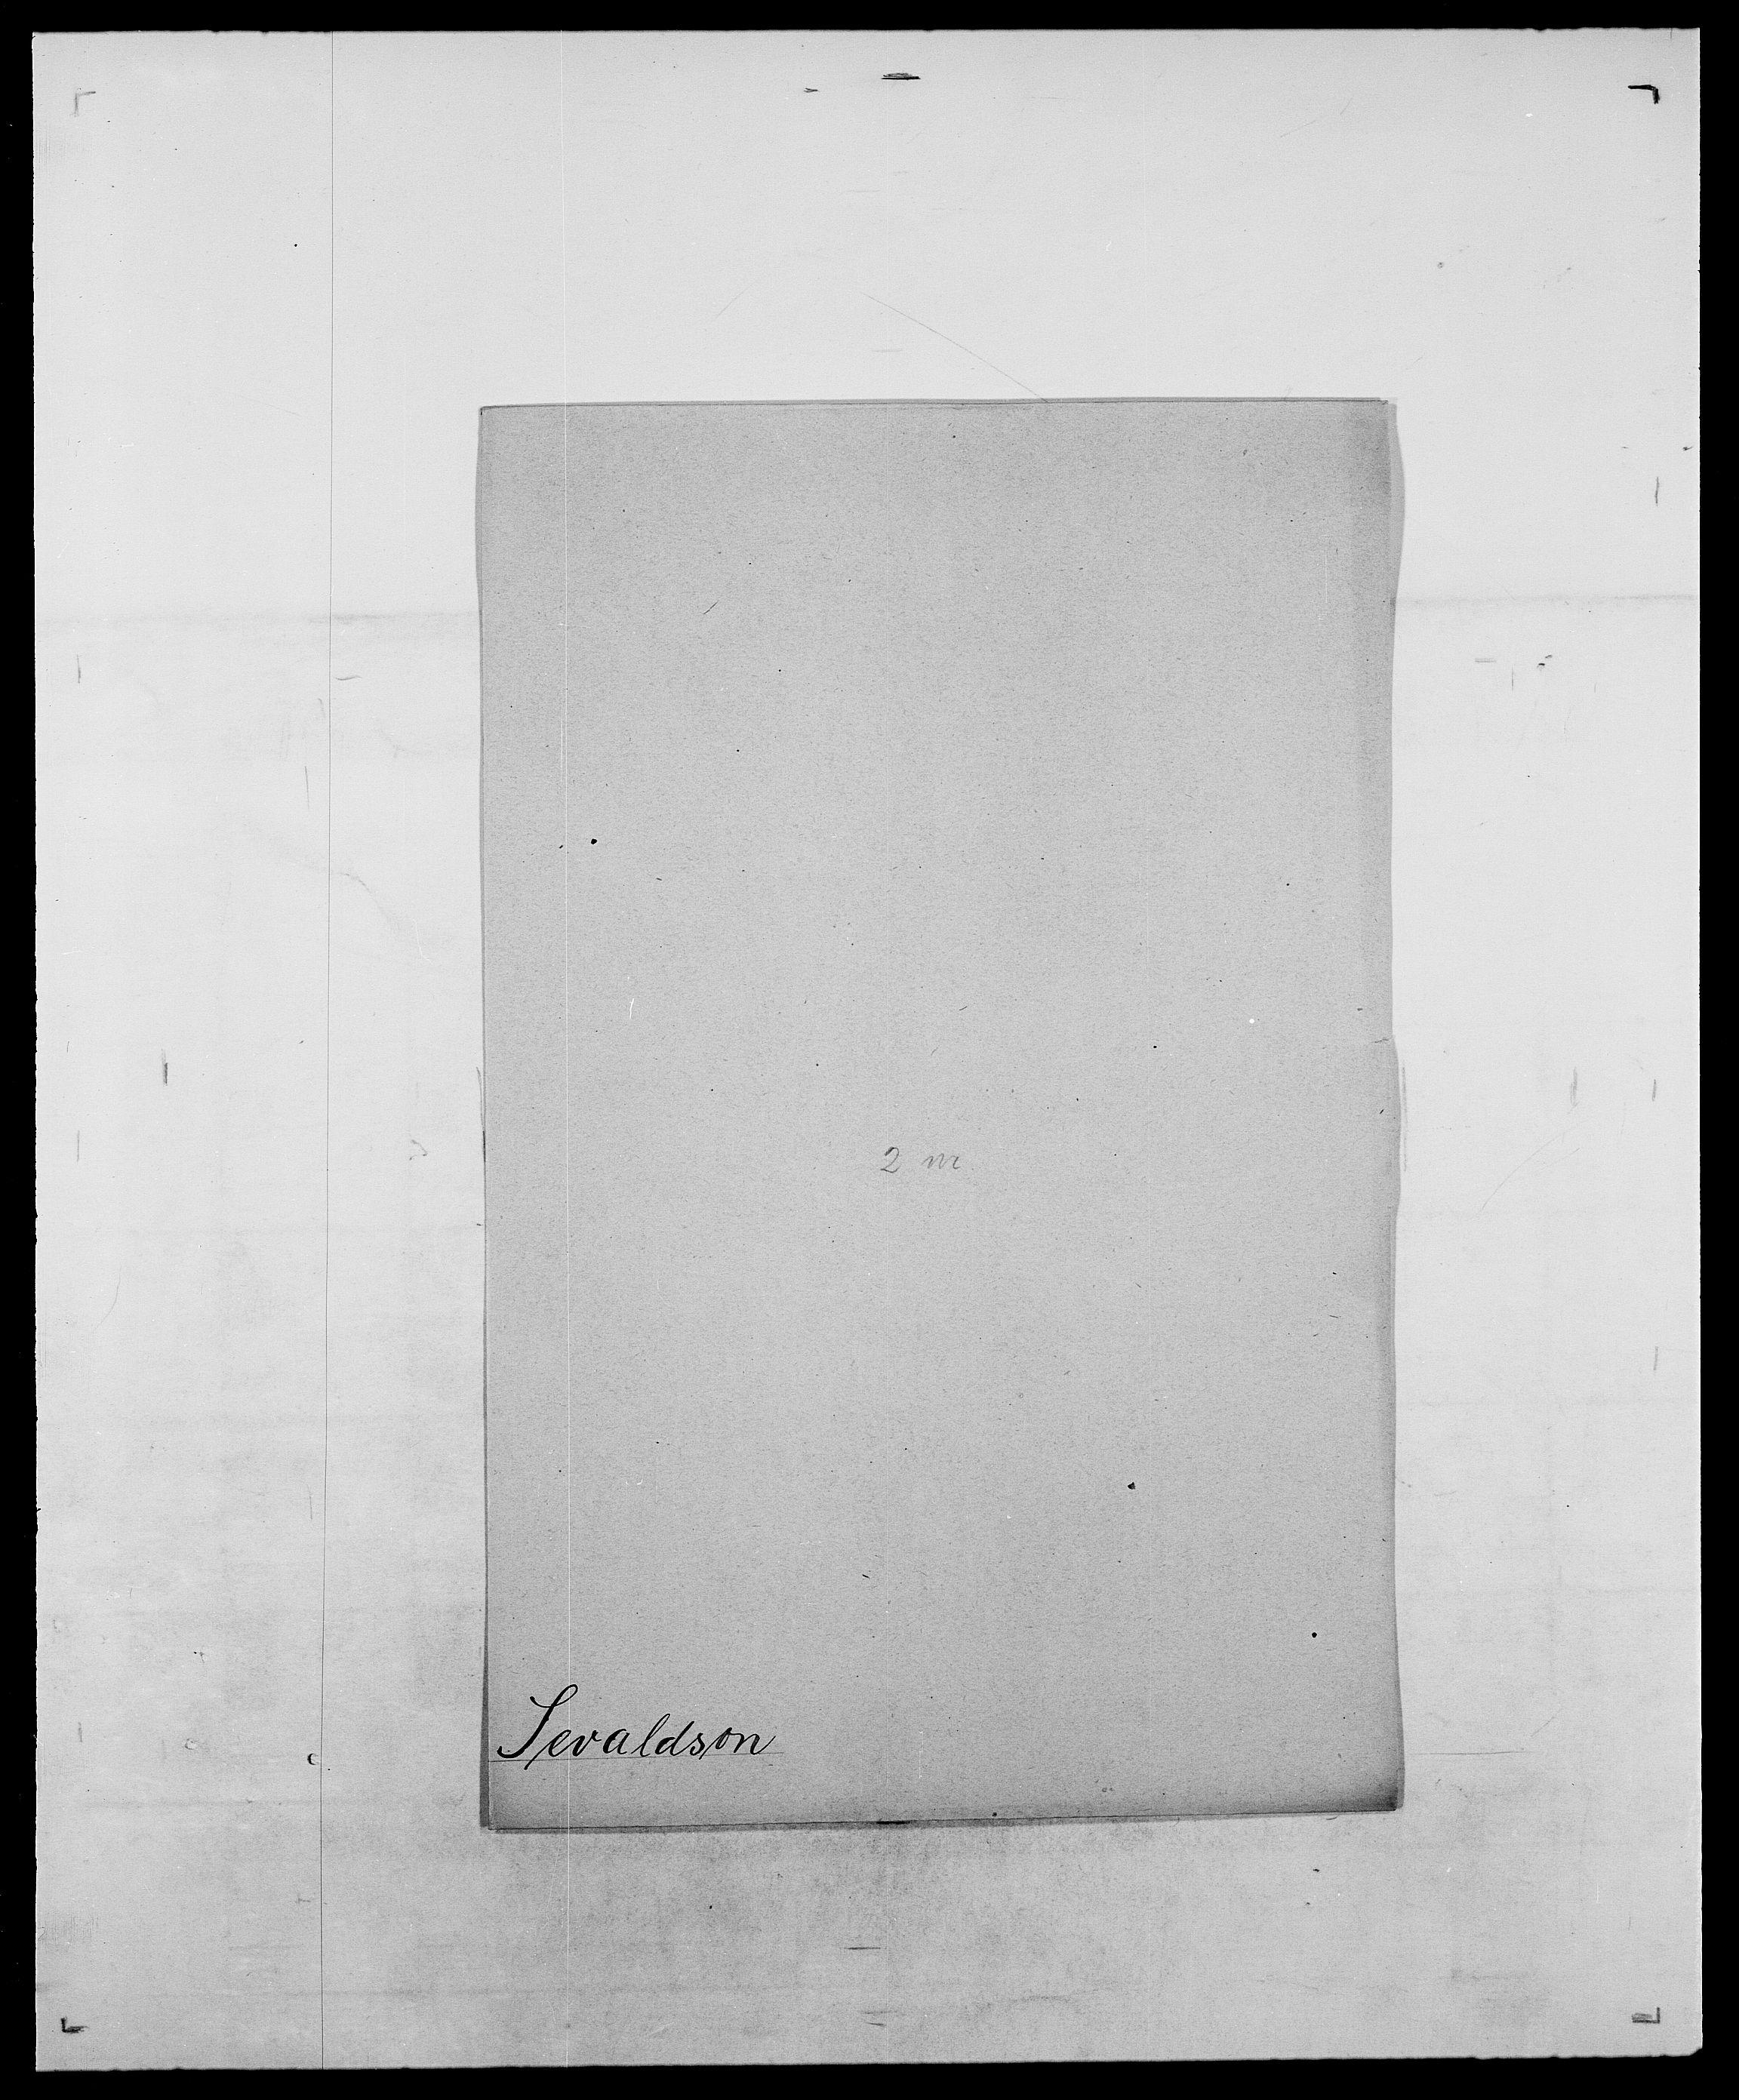 SAO, Delgobe, Charles Antoine - samling, D/Da/L0035: Schnabel - sjetman, s. 722